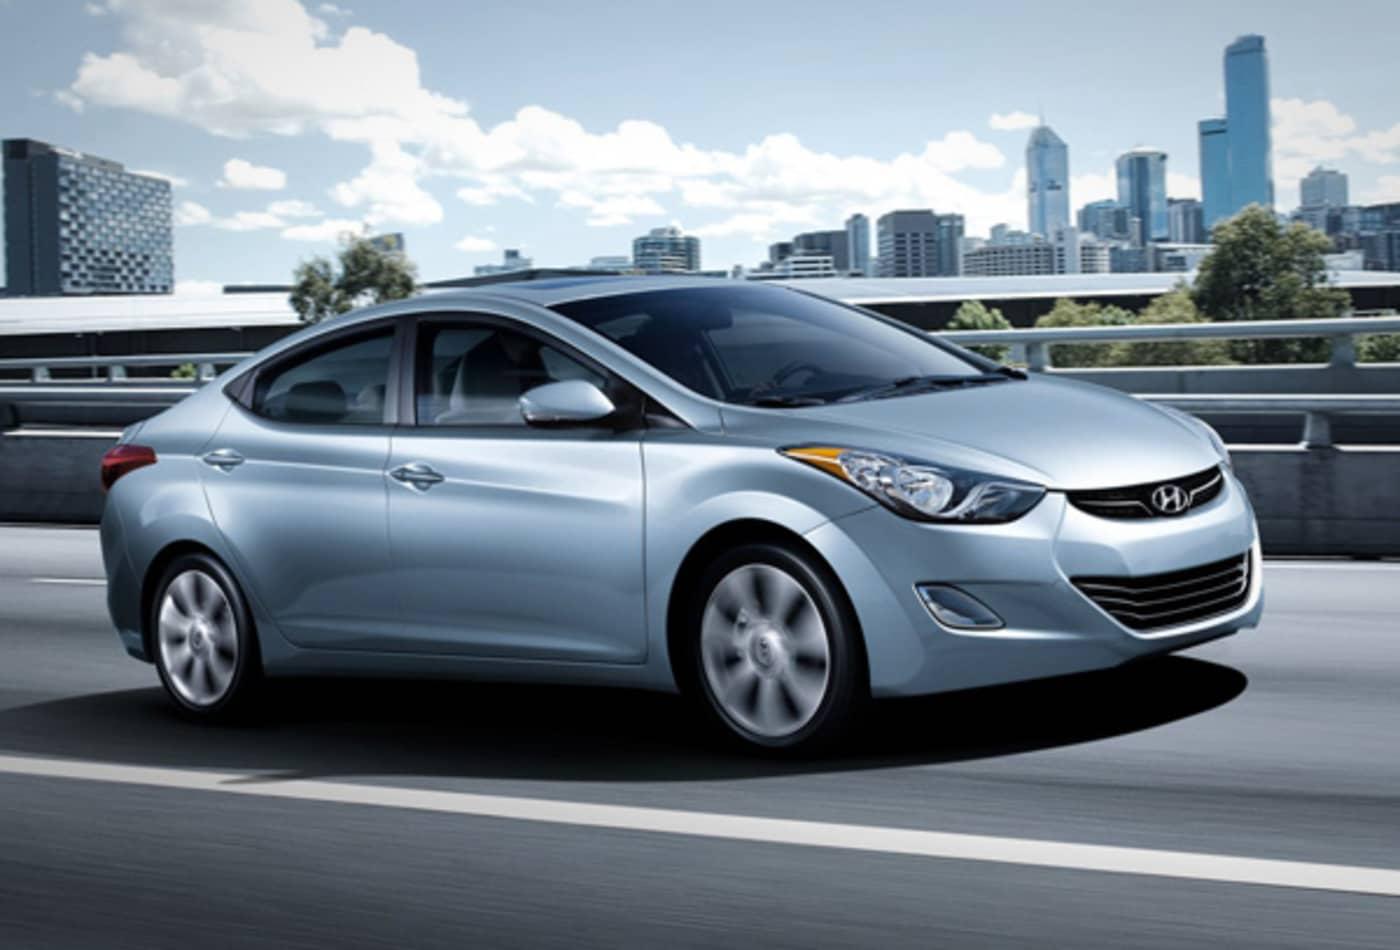 Hyundai-Elantra-Best-Cars-Commuting-CNBC.jpg